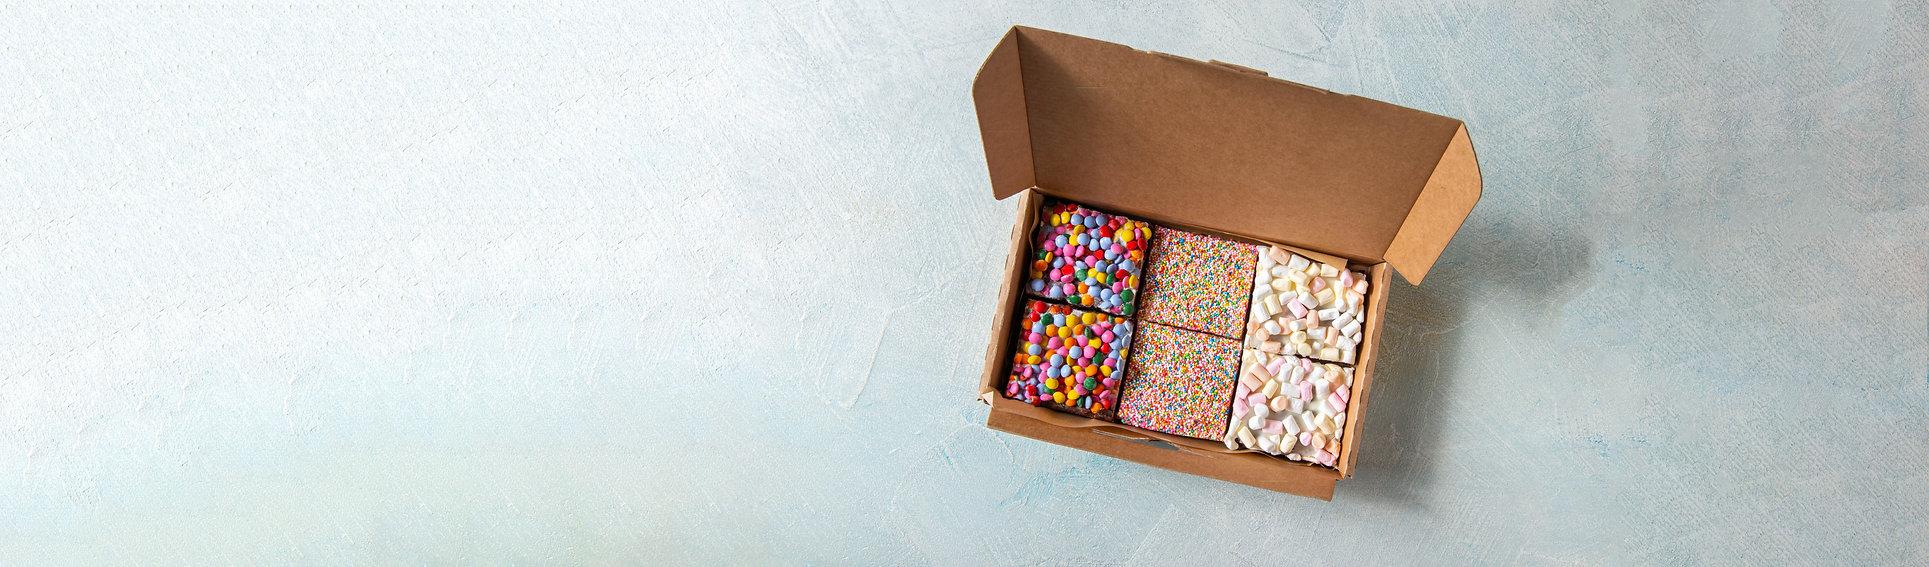 Header-brownies-bestellen-online.jpg